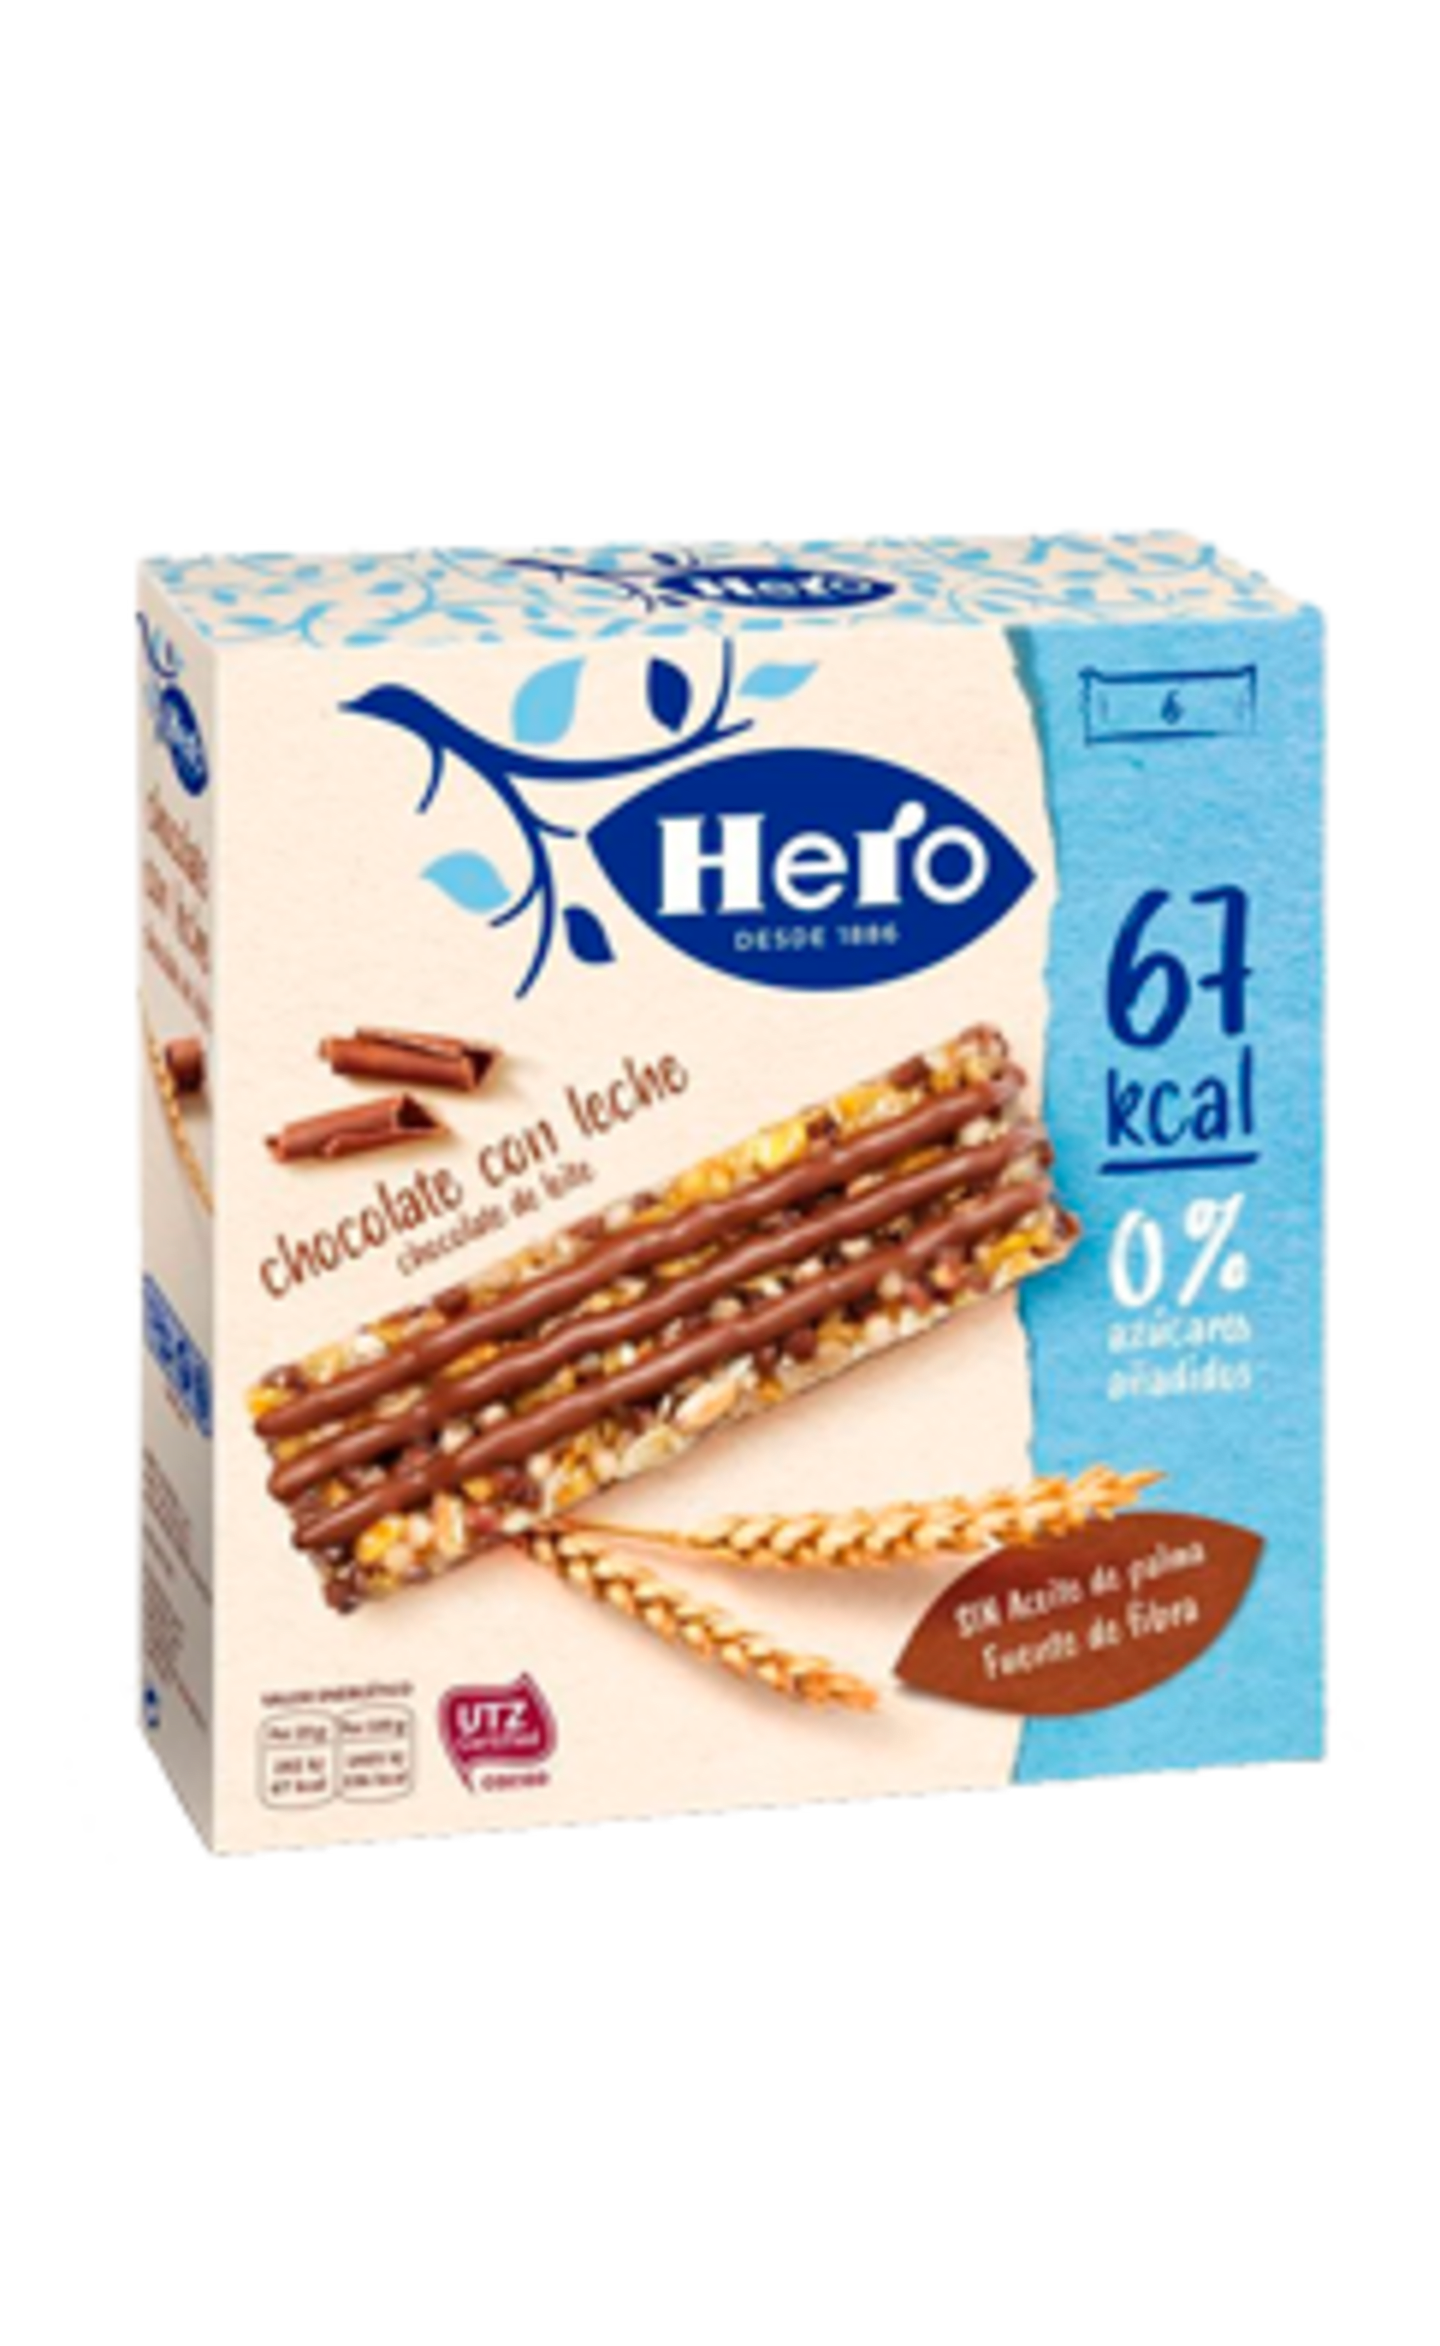 new choco leche 0%